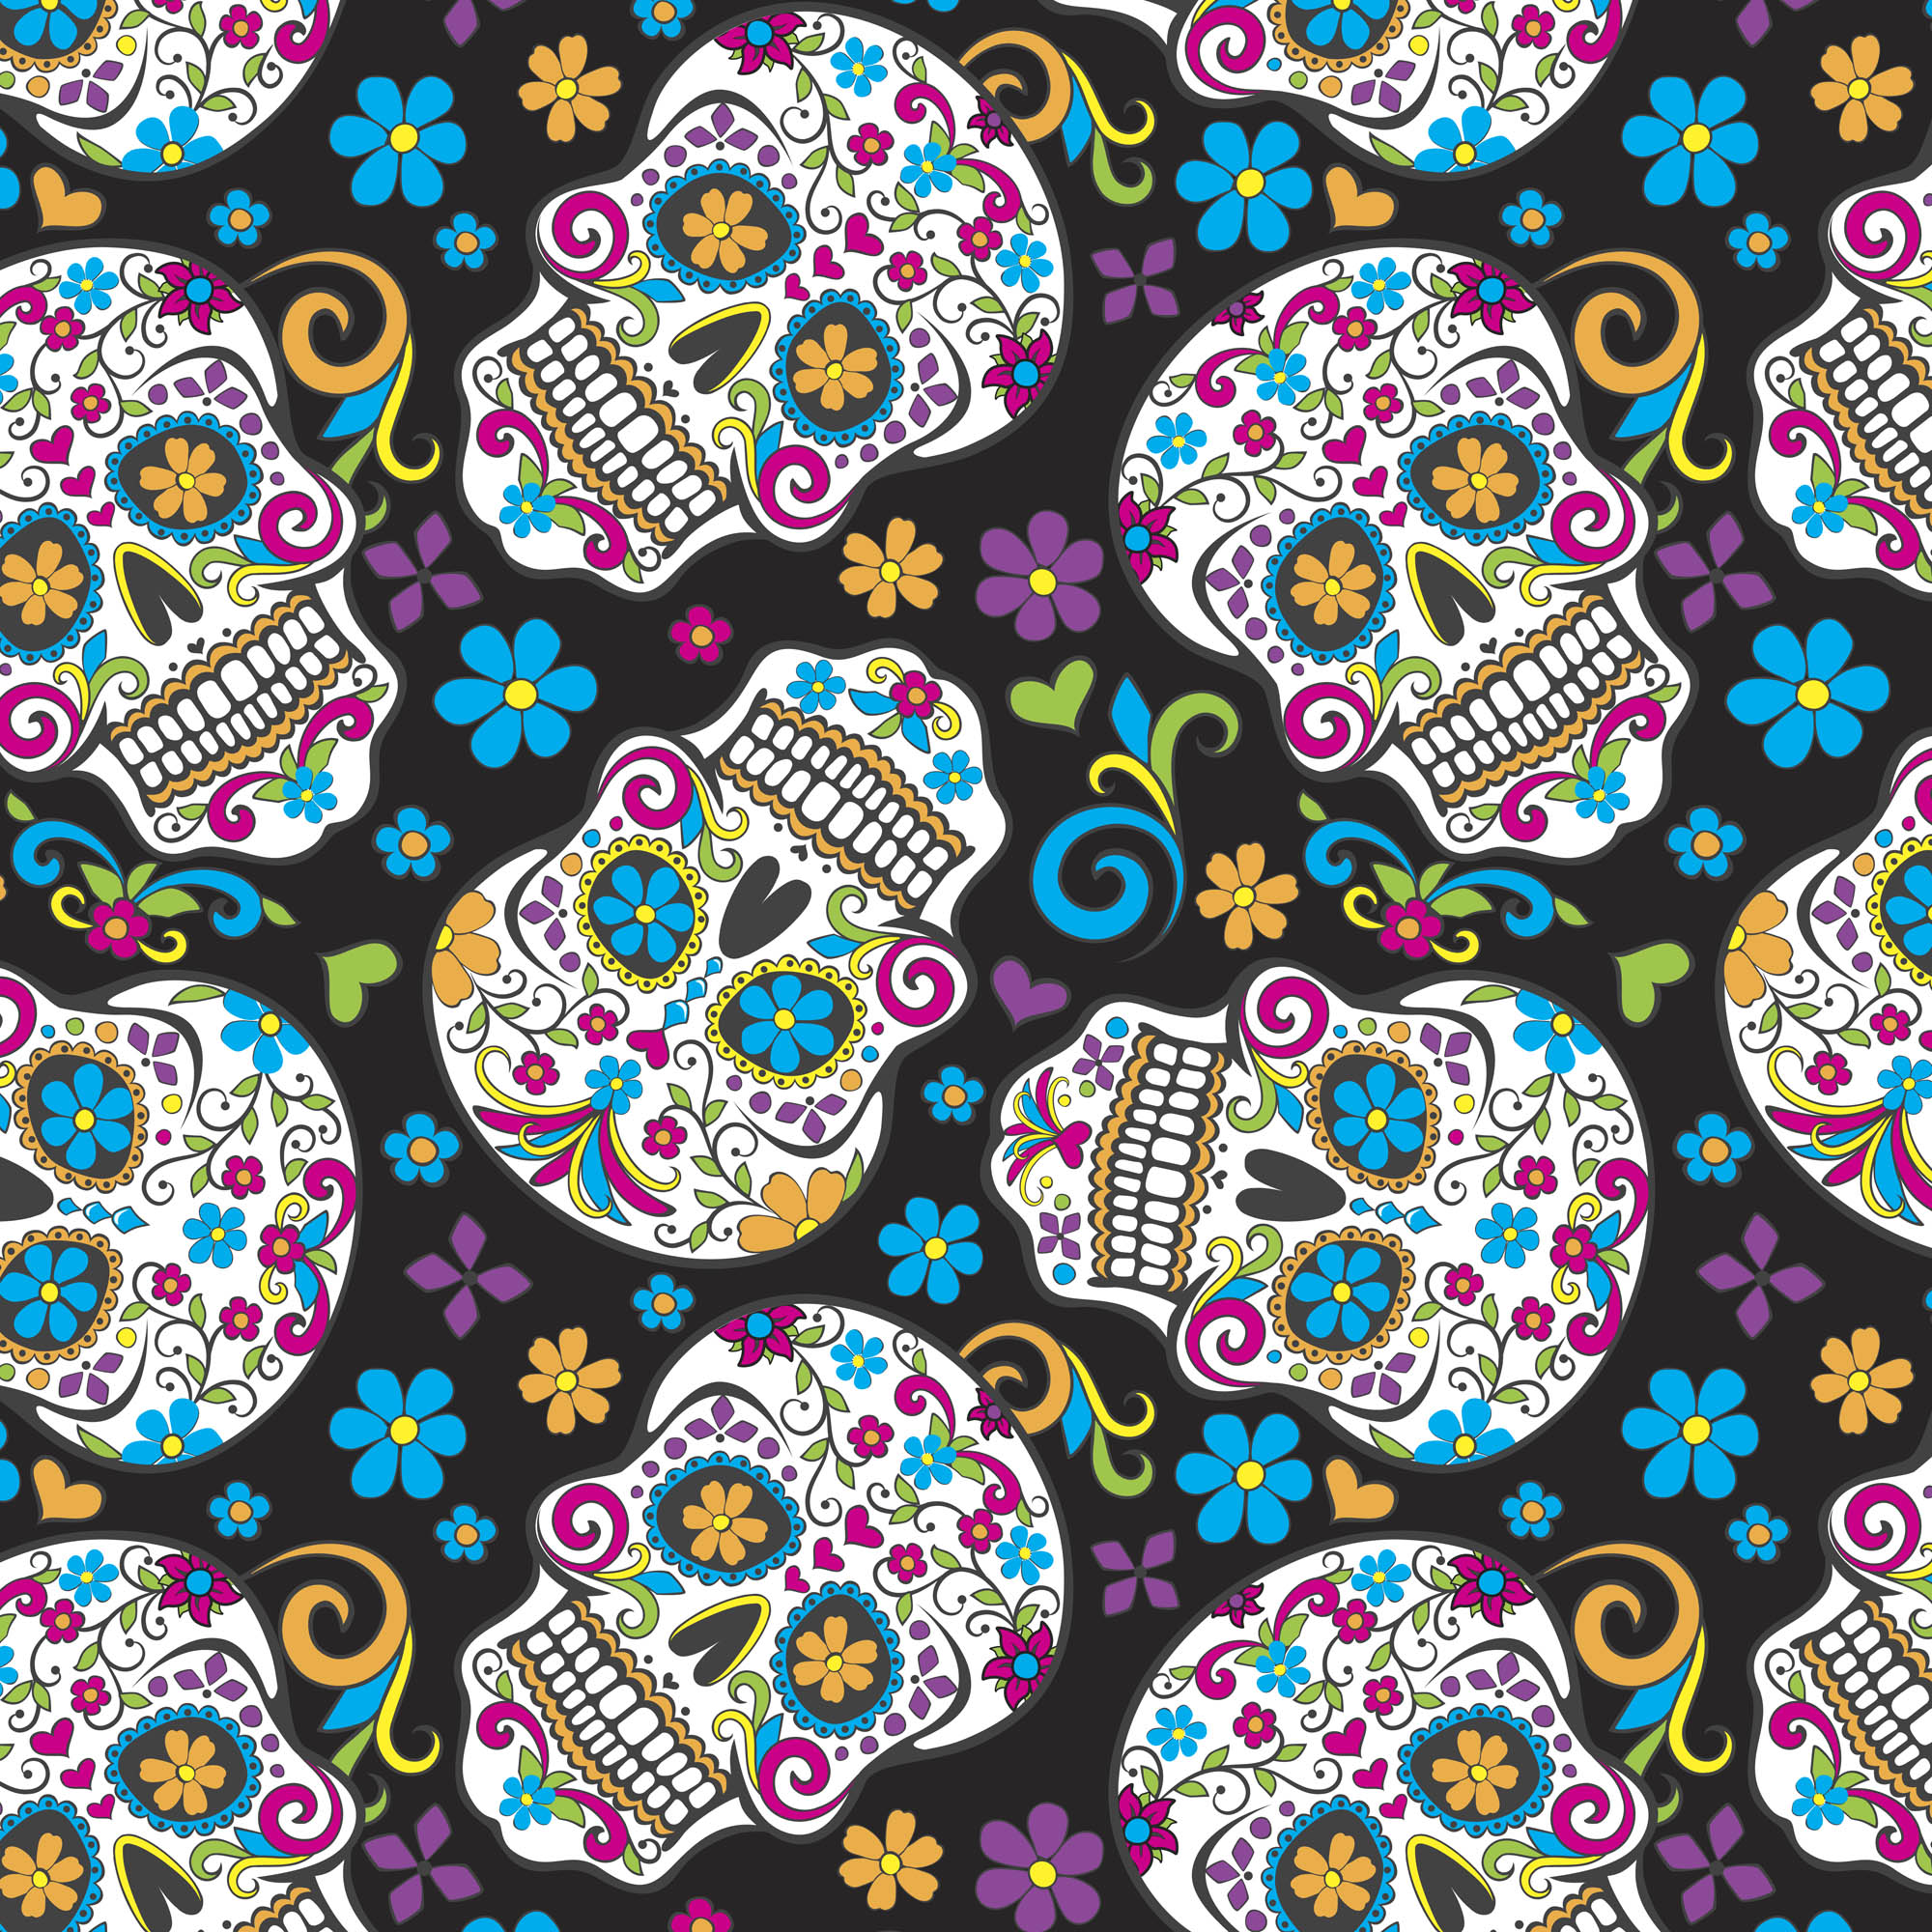 David Textiles Anti-Pill Fleece Folkloric Skulls On Black Fabric, per Yard